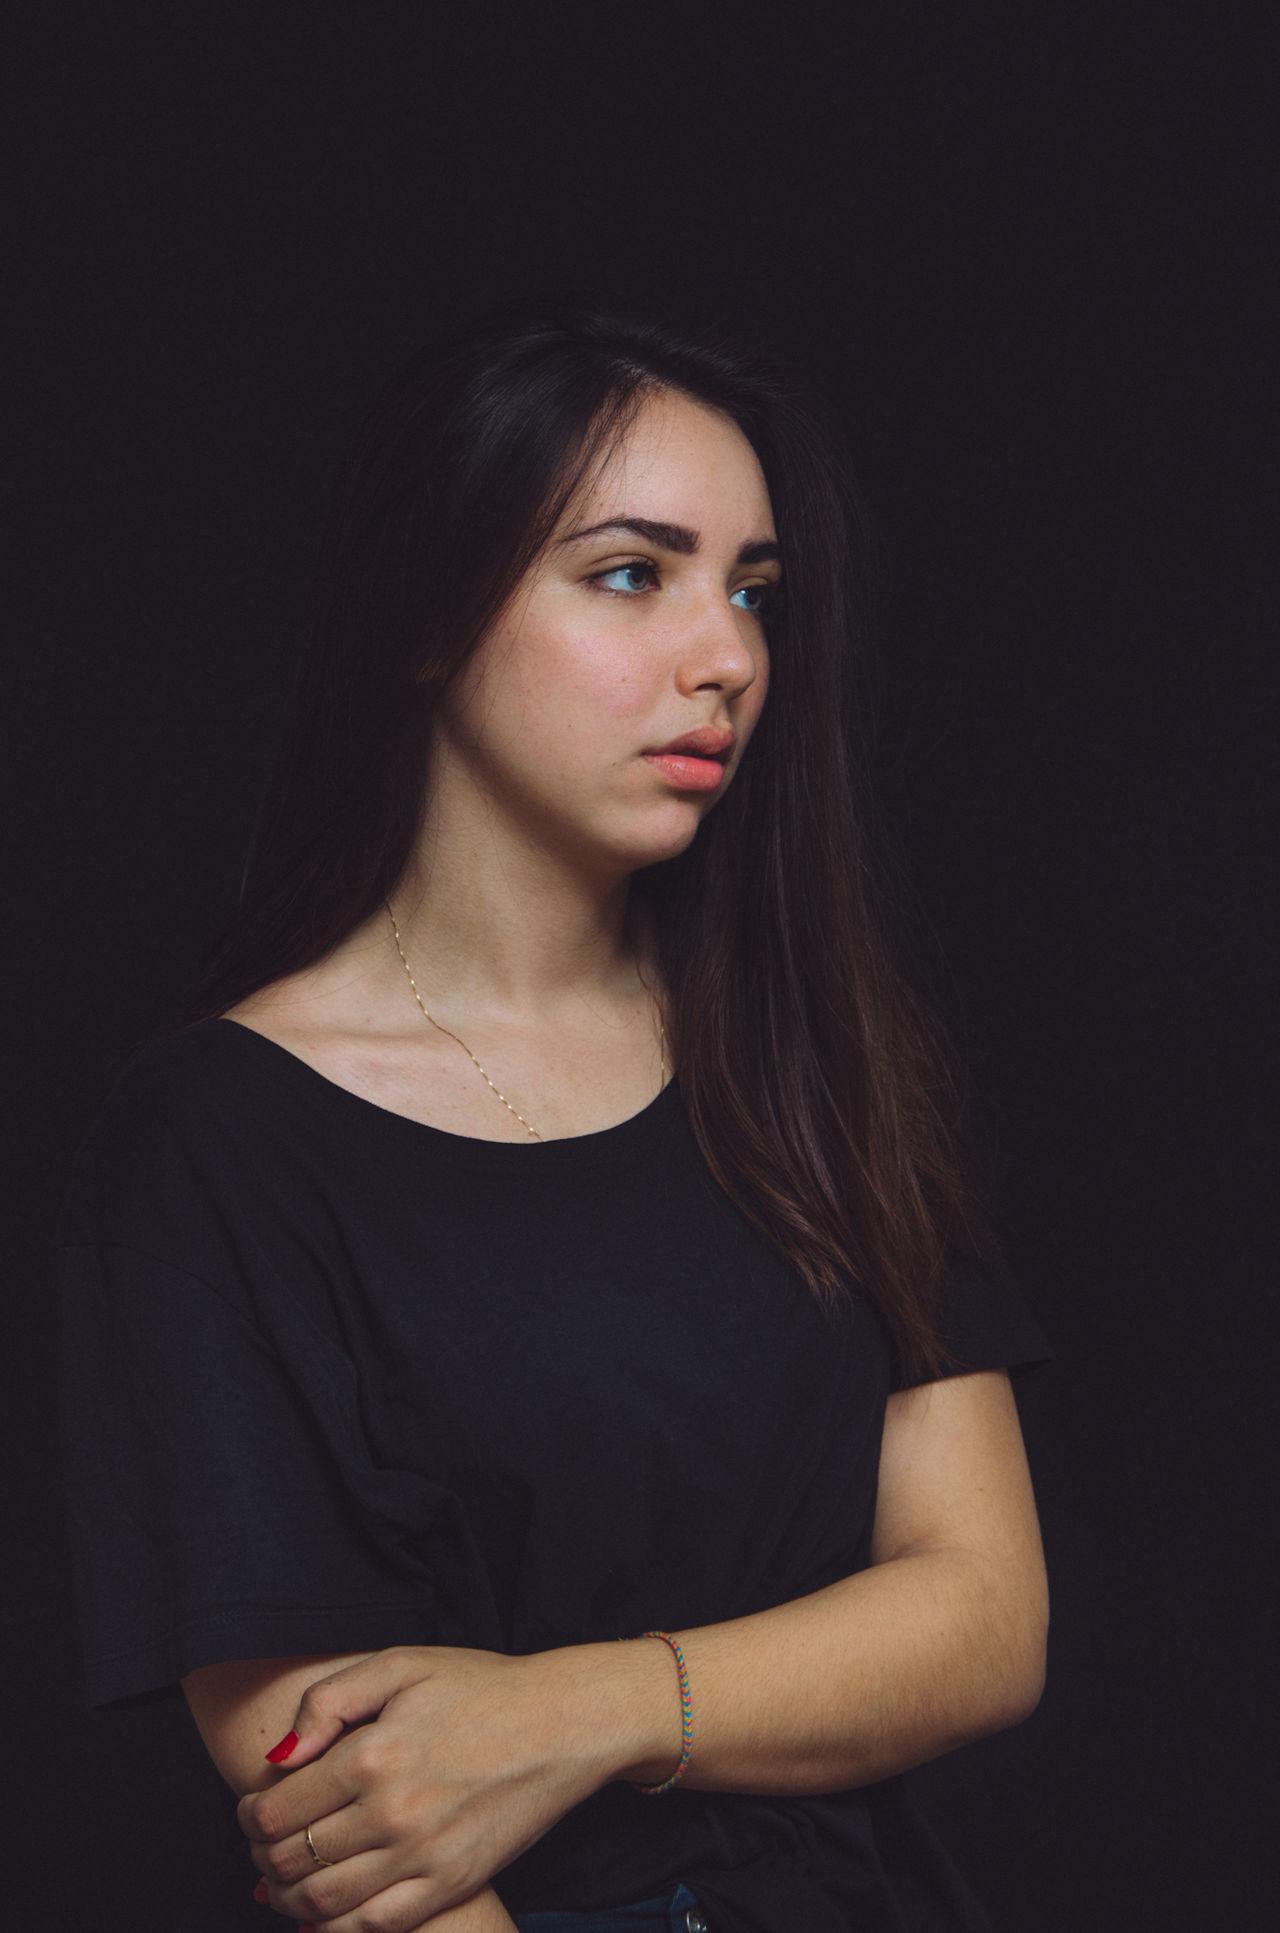 Beautiful stock photos of black background, 18-19 Years, Beautiful Woman, Beauty, Black Background